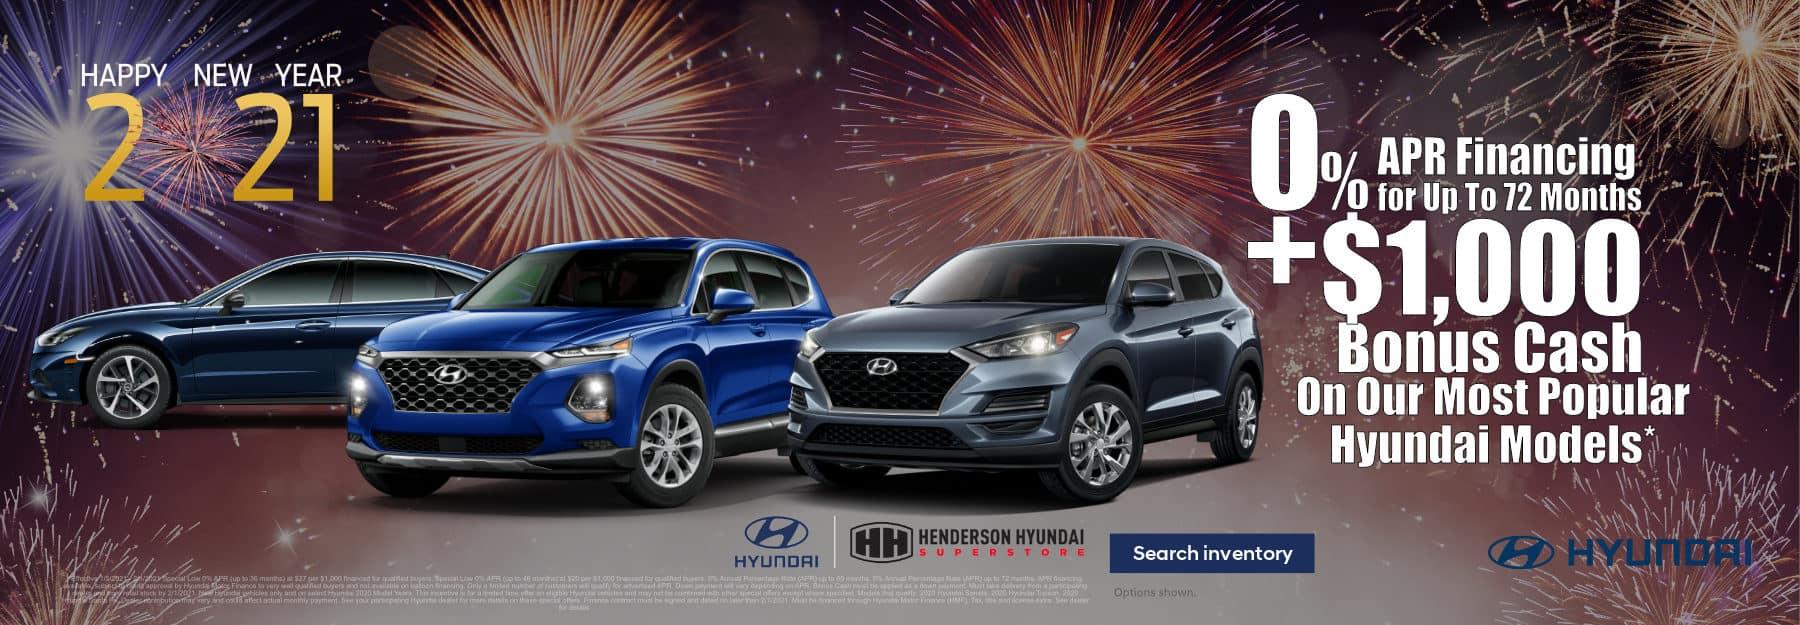 January_2021_General_HENDERSON_Hyundai